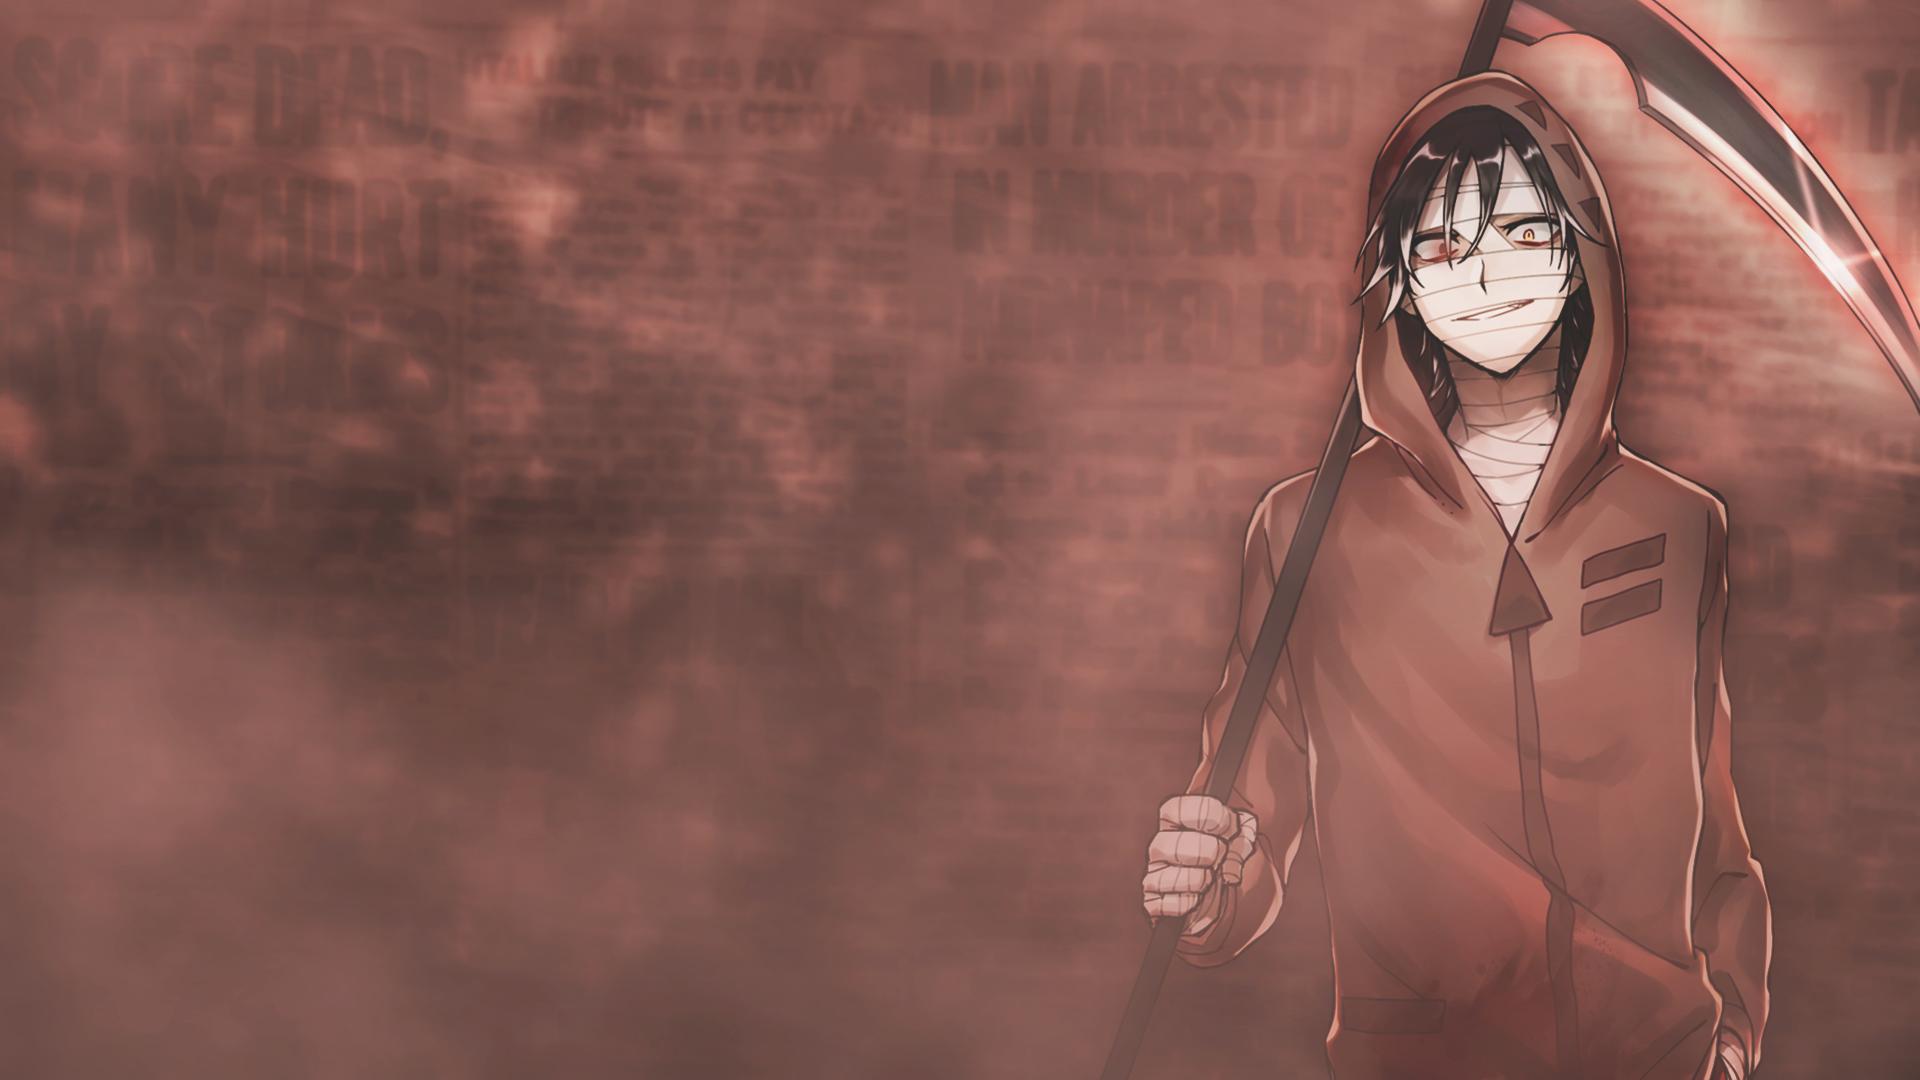 Angels Of Death Anime Wallpaper Zack By Chromha On Deviantart